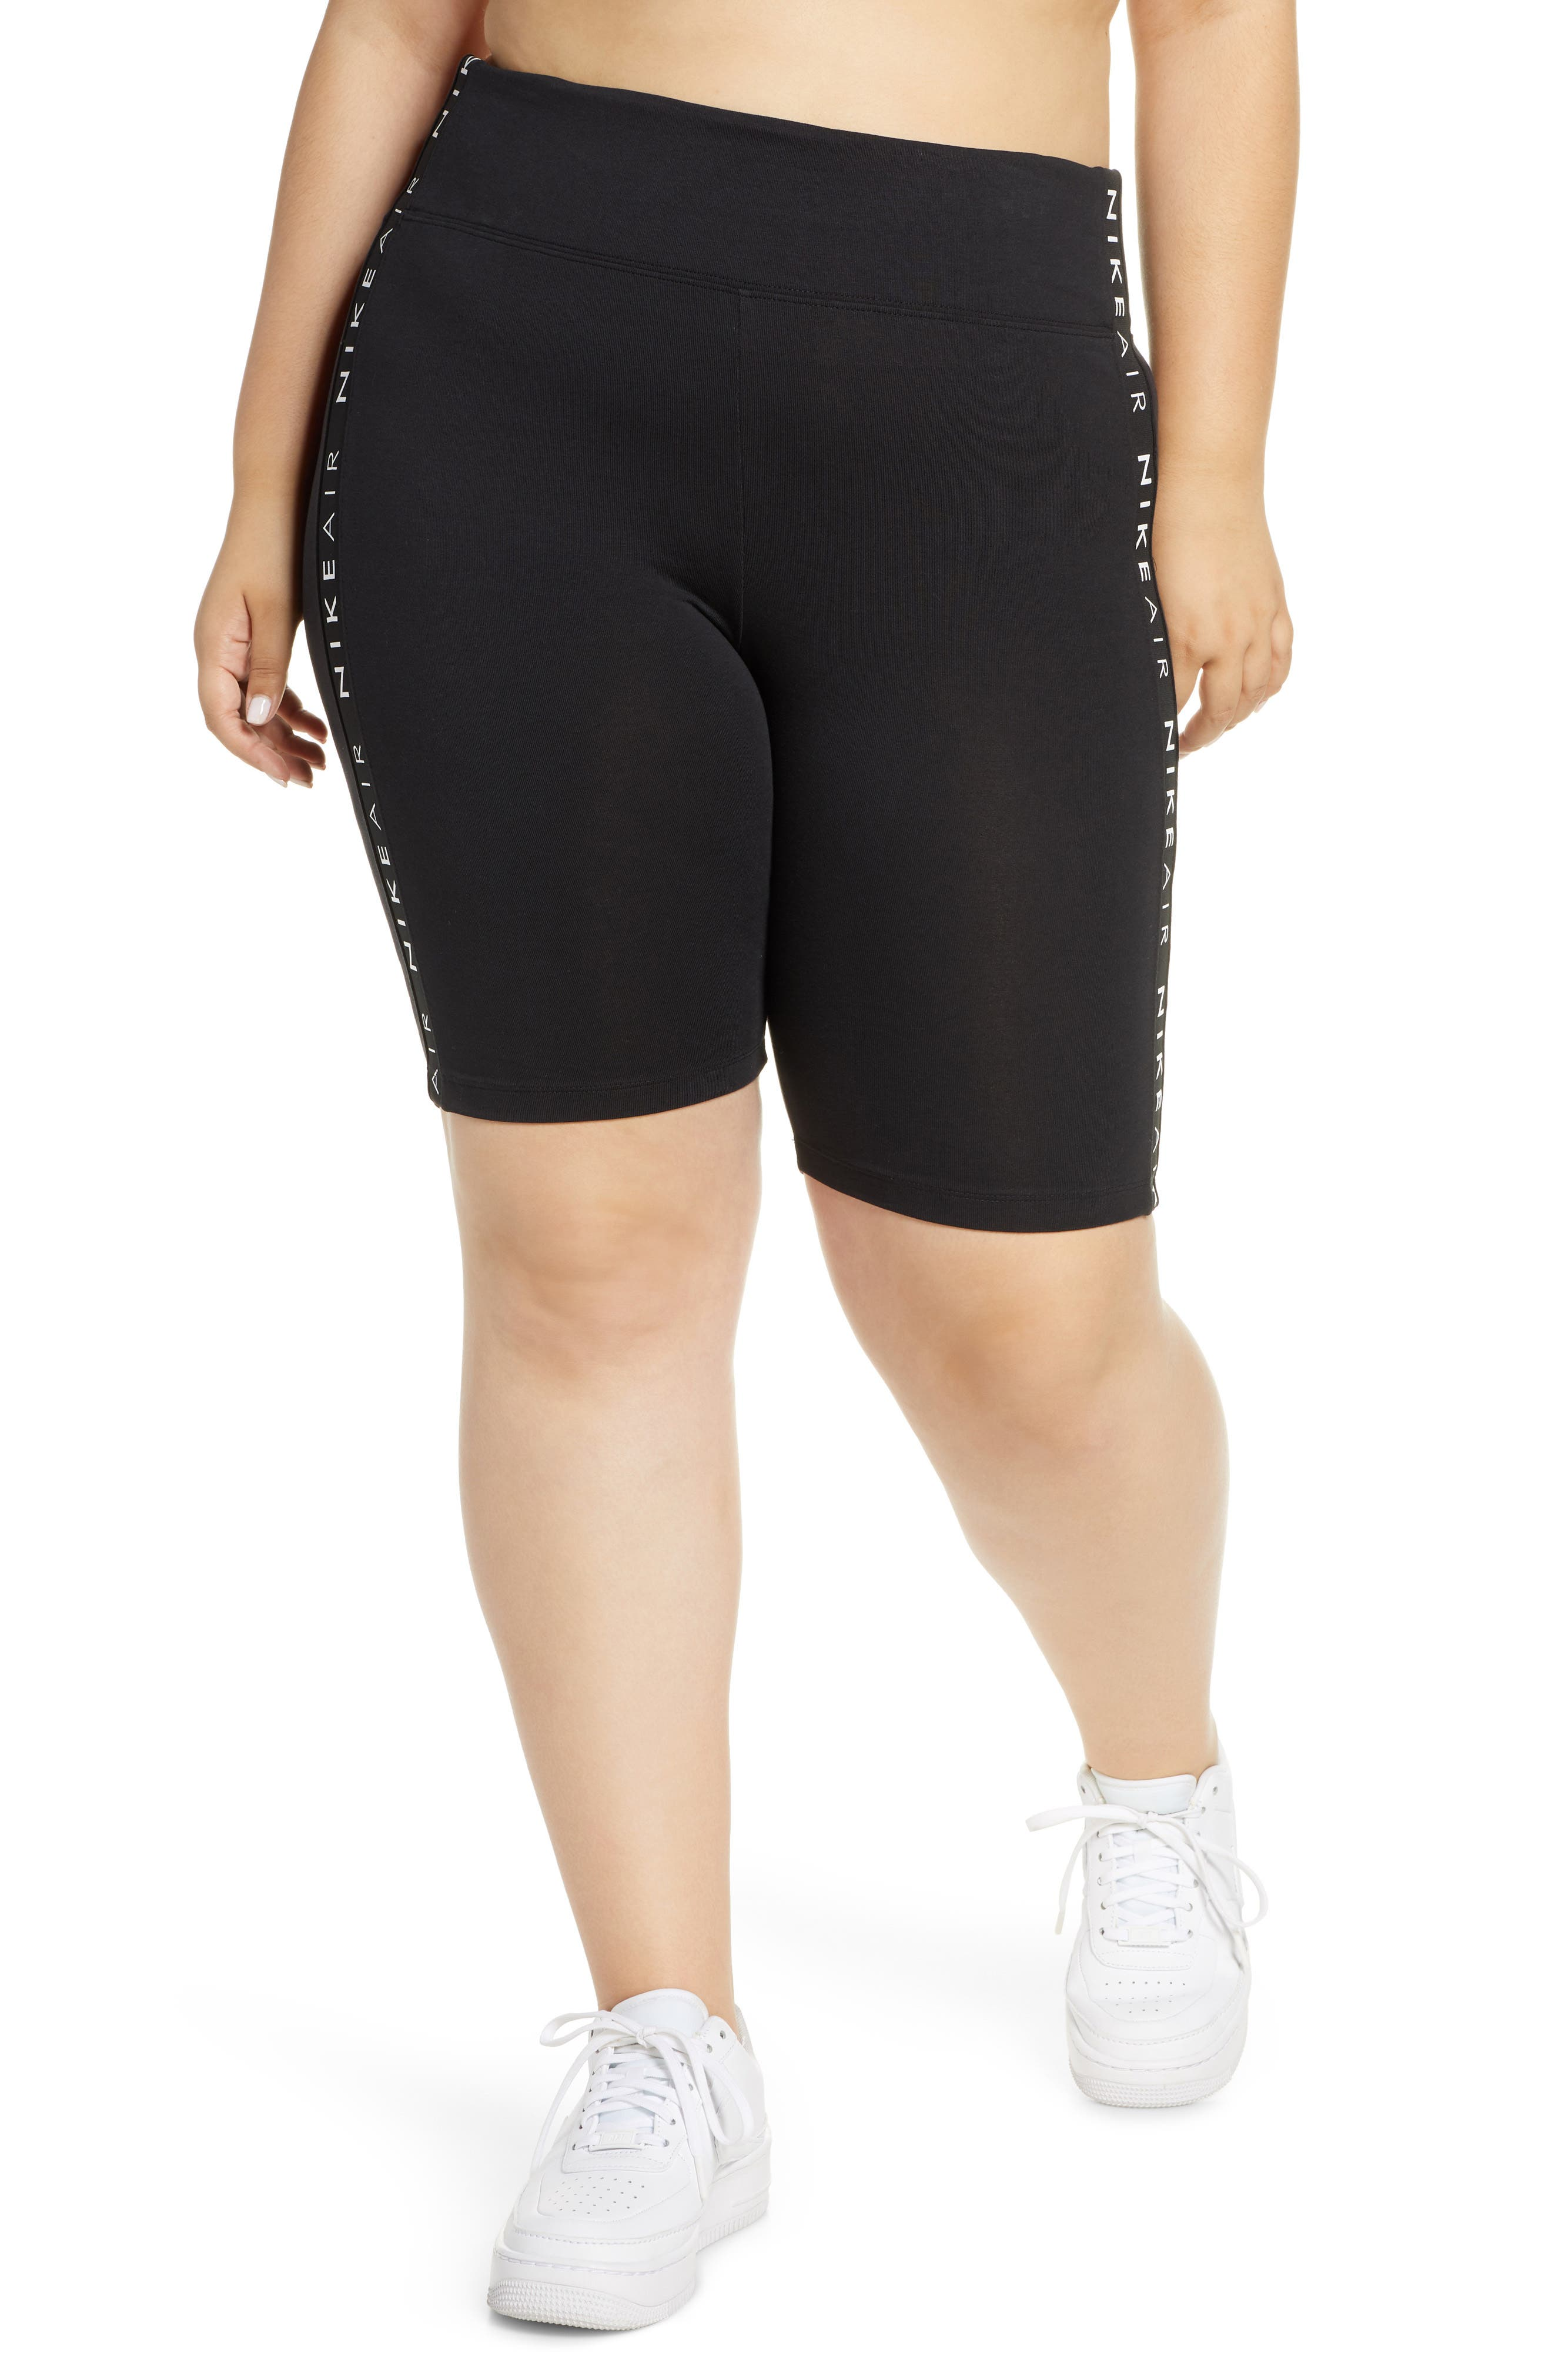 Plus Women's Nike Sportswear Air High Waist Bike Shorts